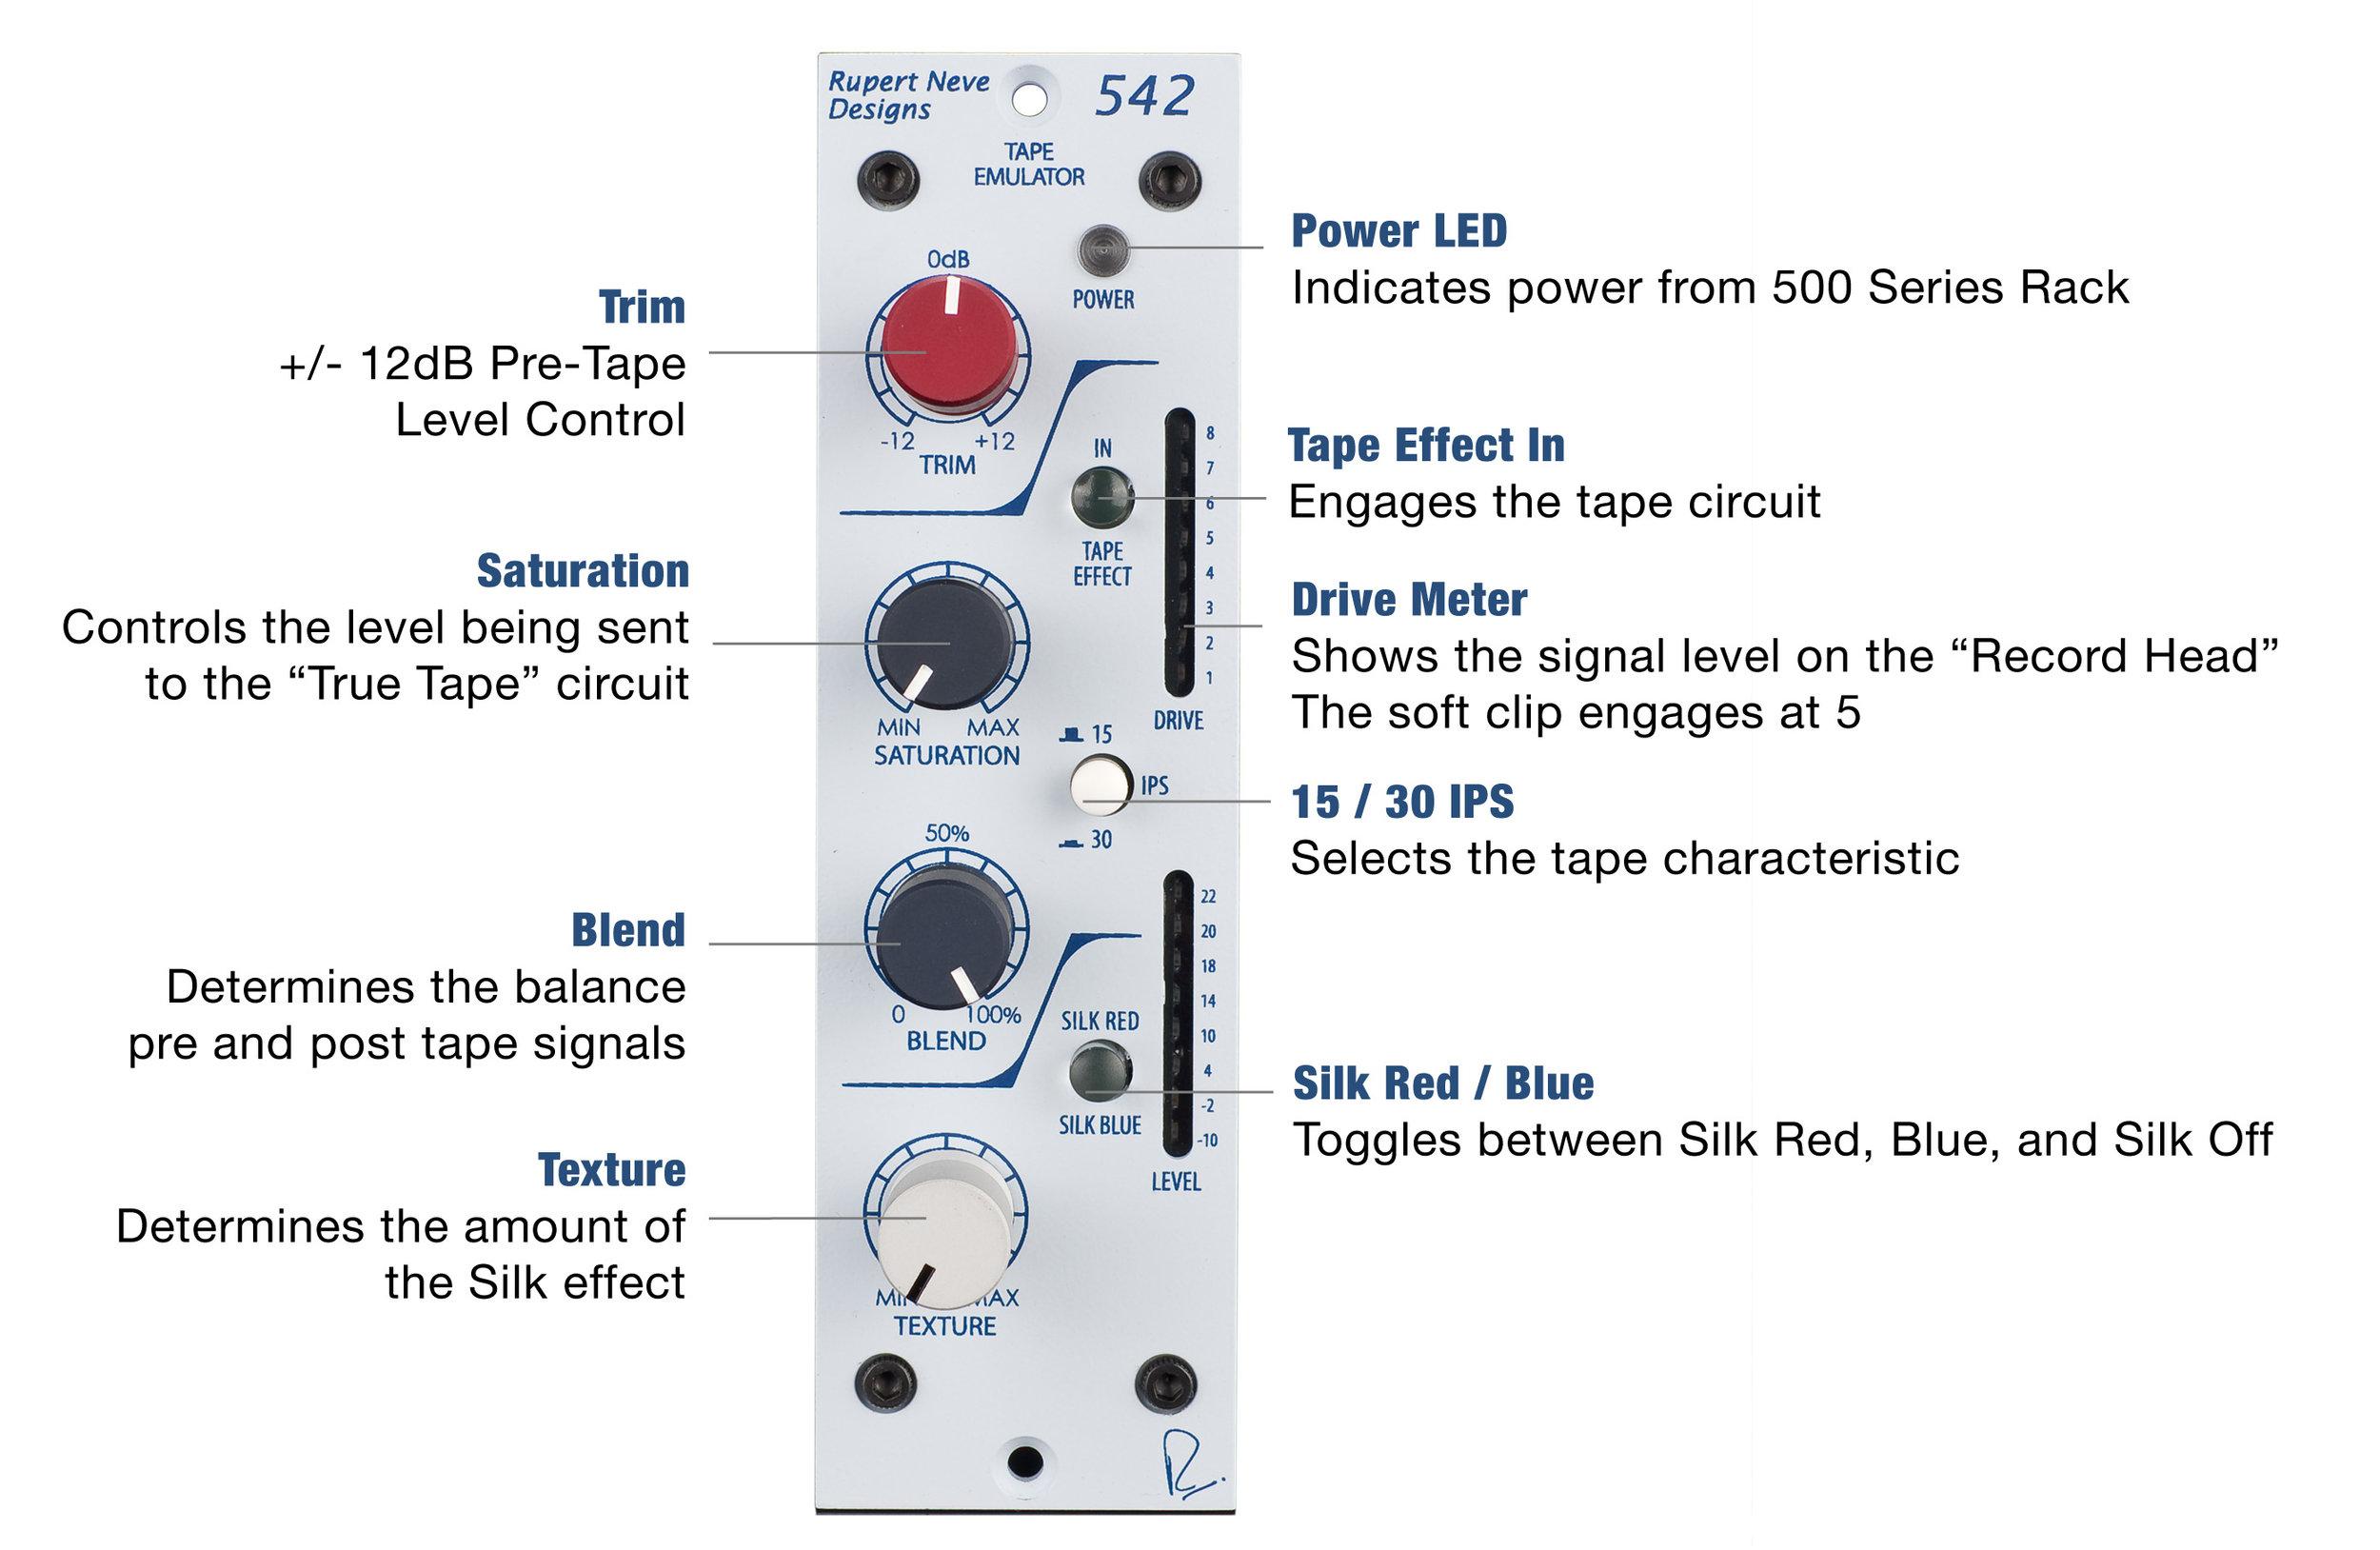 THE B2 BOMBER ANALOG / DIGITAL CONVERTER:burlaudio.com/products/b2-bomber-adc